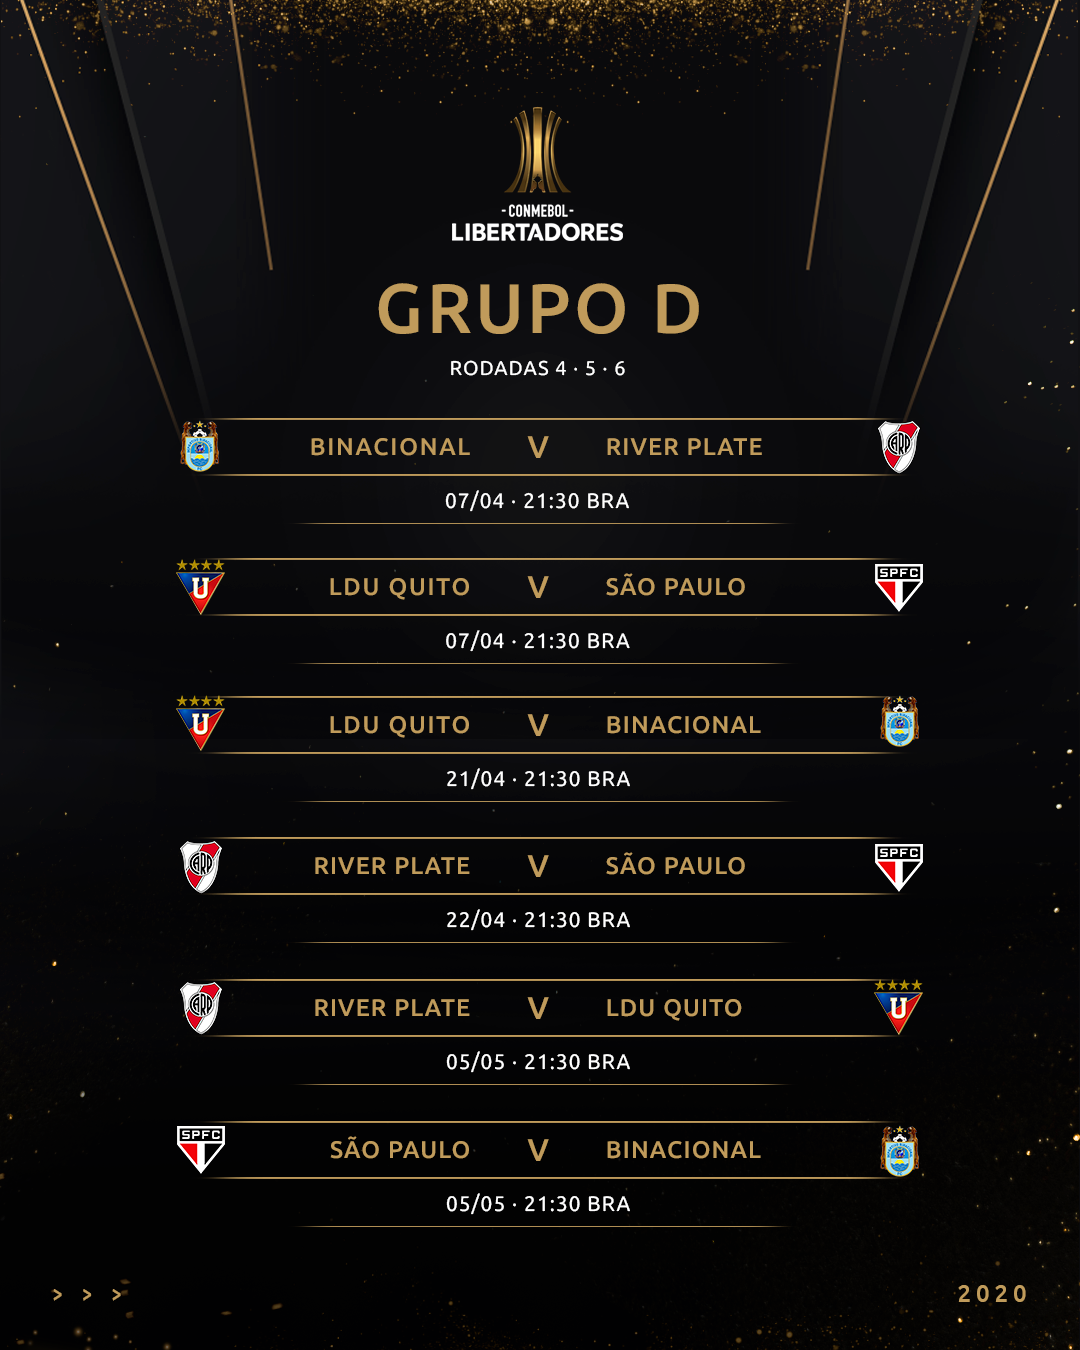 Grupo D - Libertadores - tabela 2